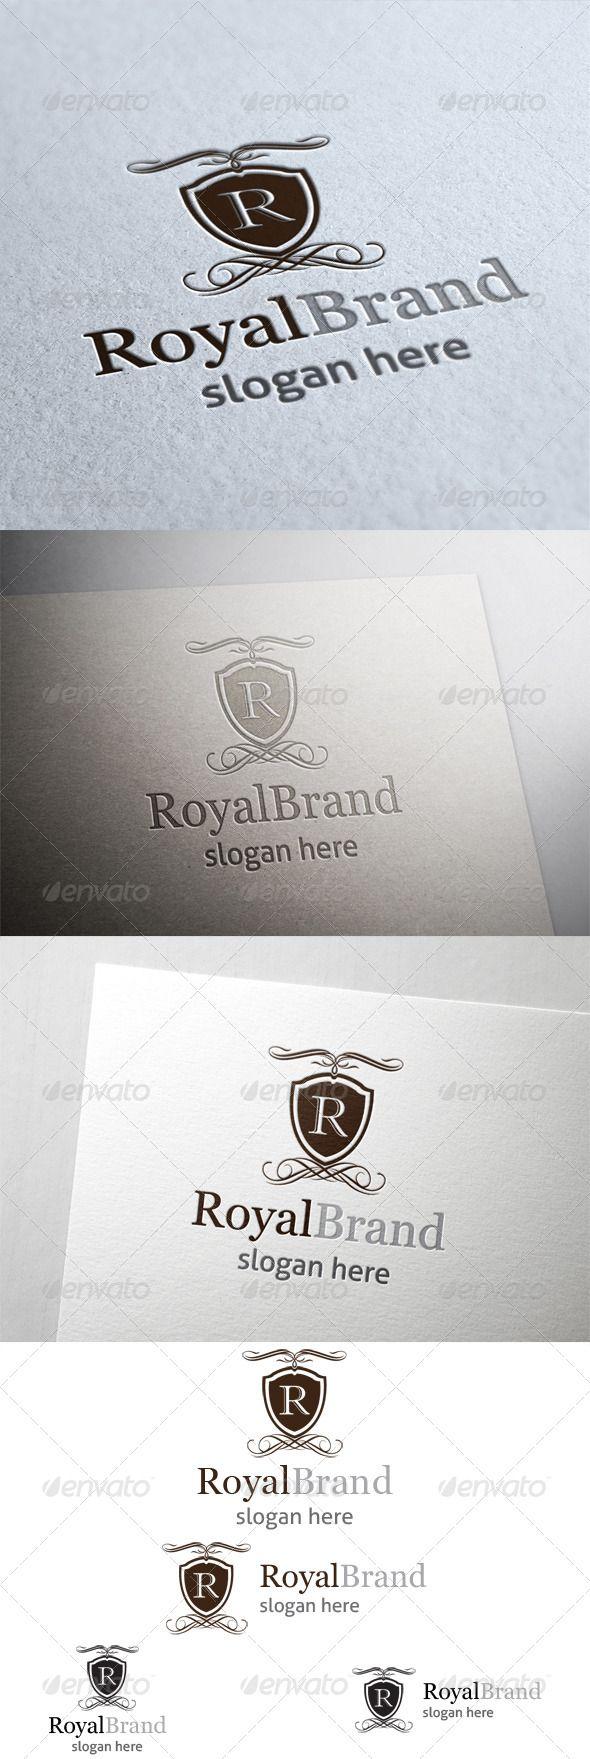 Royal Brand Logo GraphicRiver Royal Brand Logo. All in